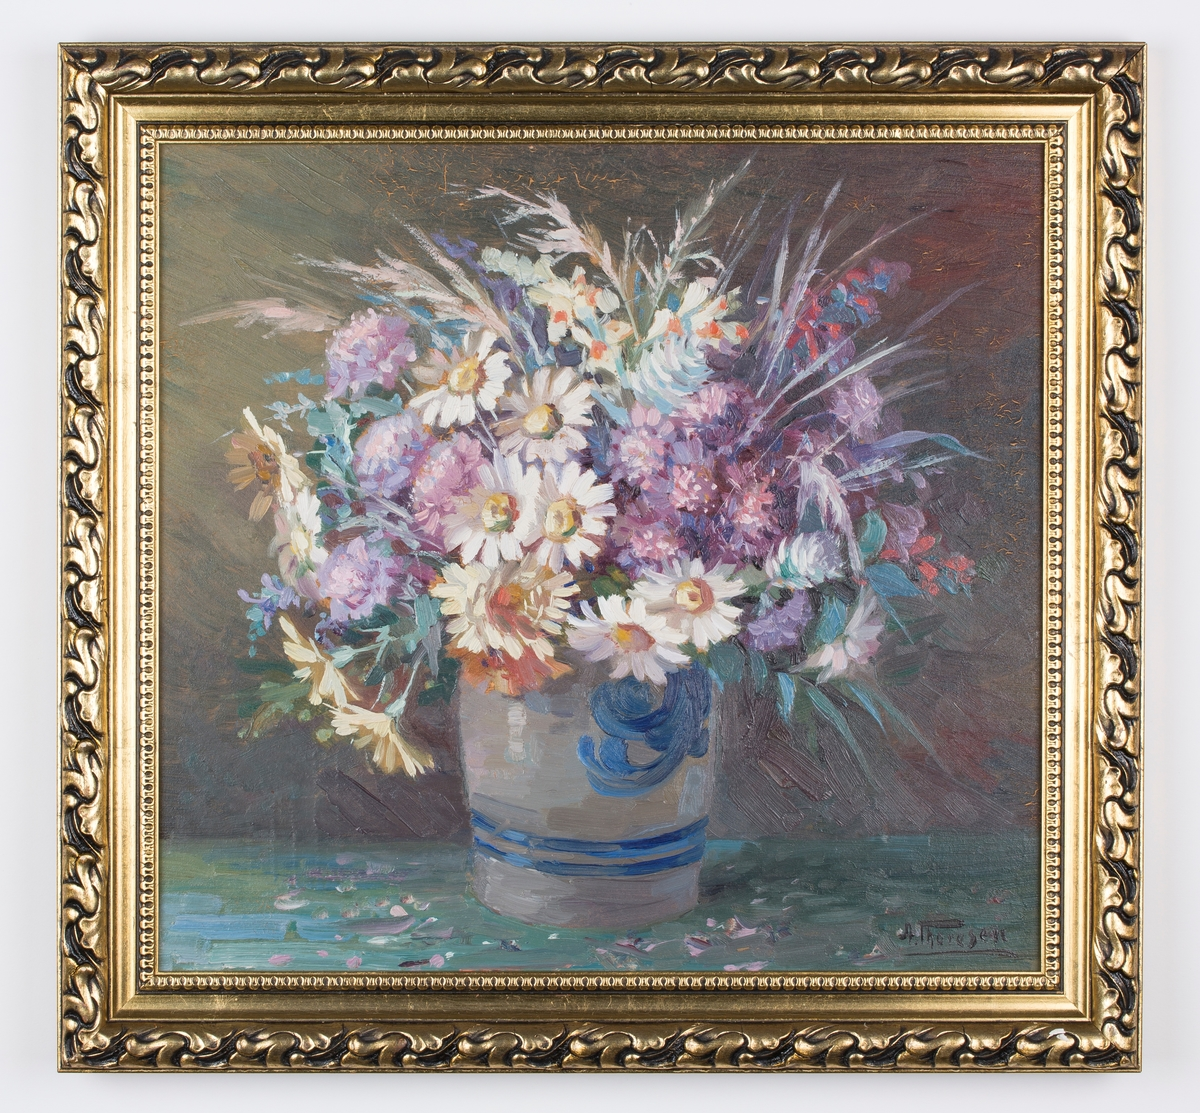 Blomterbukett i vase